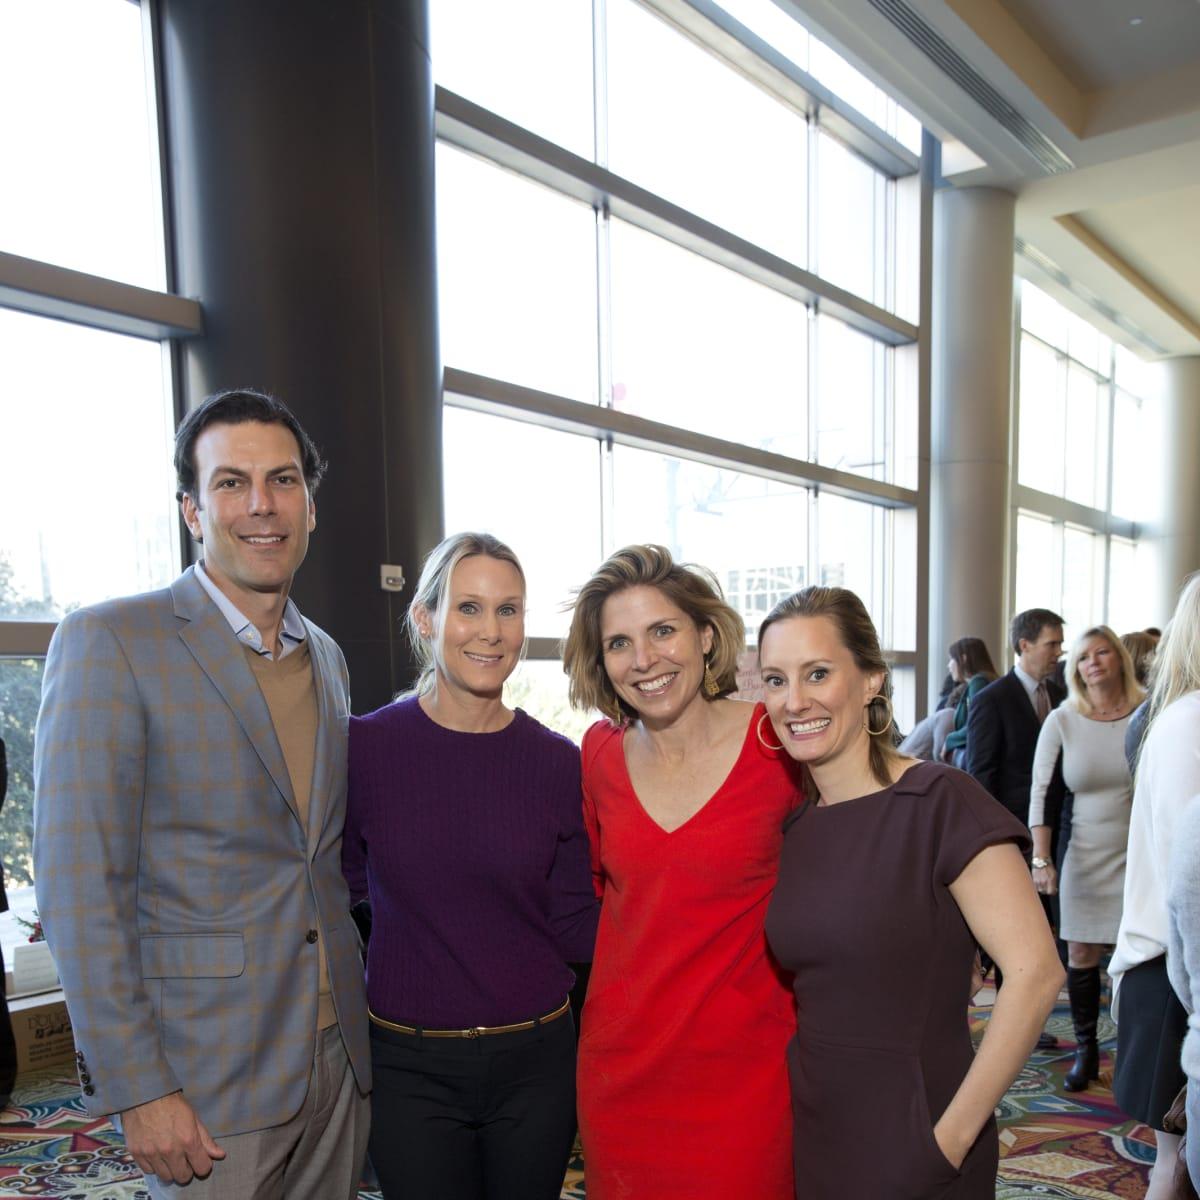 Bo's Place Luncheon, Feb. 2016, Kent Chenevert, Debbie Chenevert, Winifred Riser, Allison Stasney